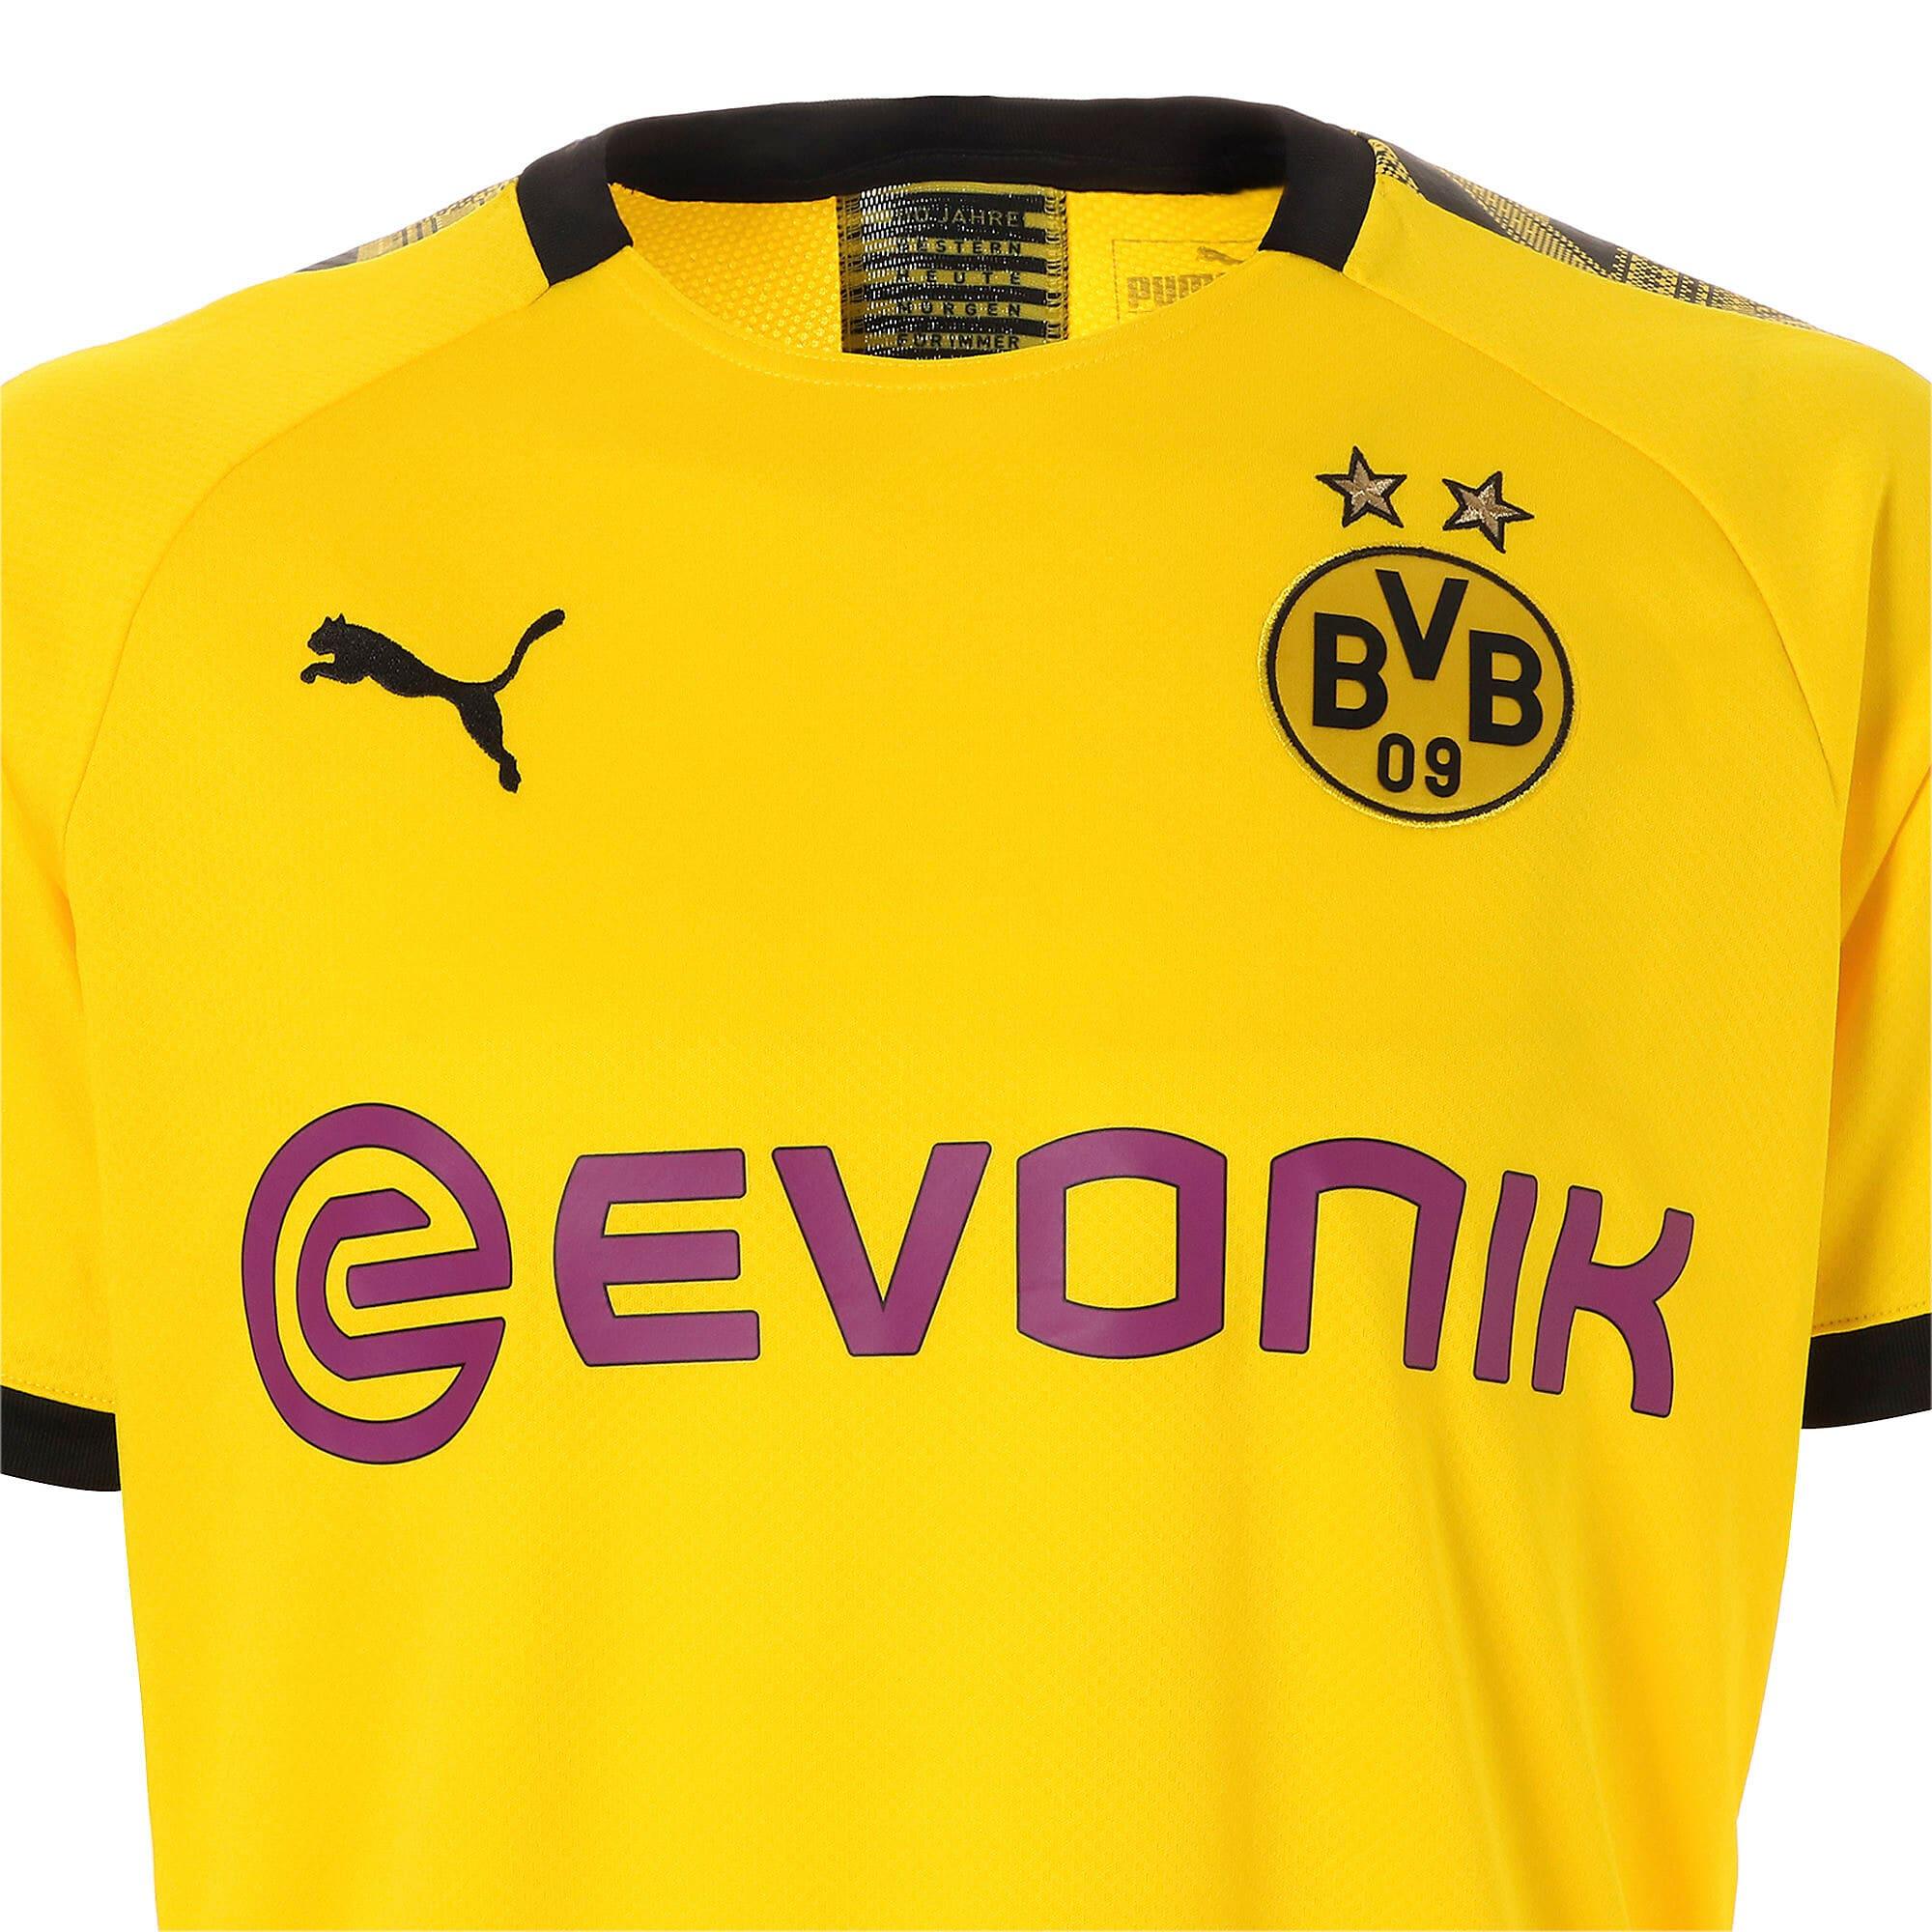 Thumbnail 7 of ドルトムント BVB SS ホーム レプリカシャツ 半袖, Cyber Yellow-Puma Black, medium-JPN